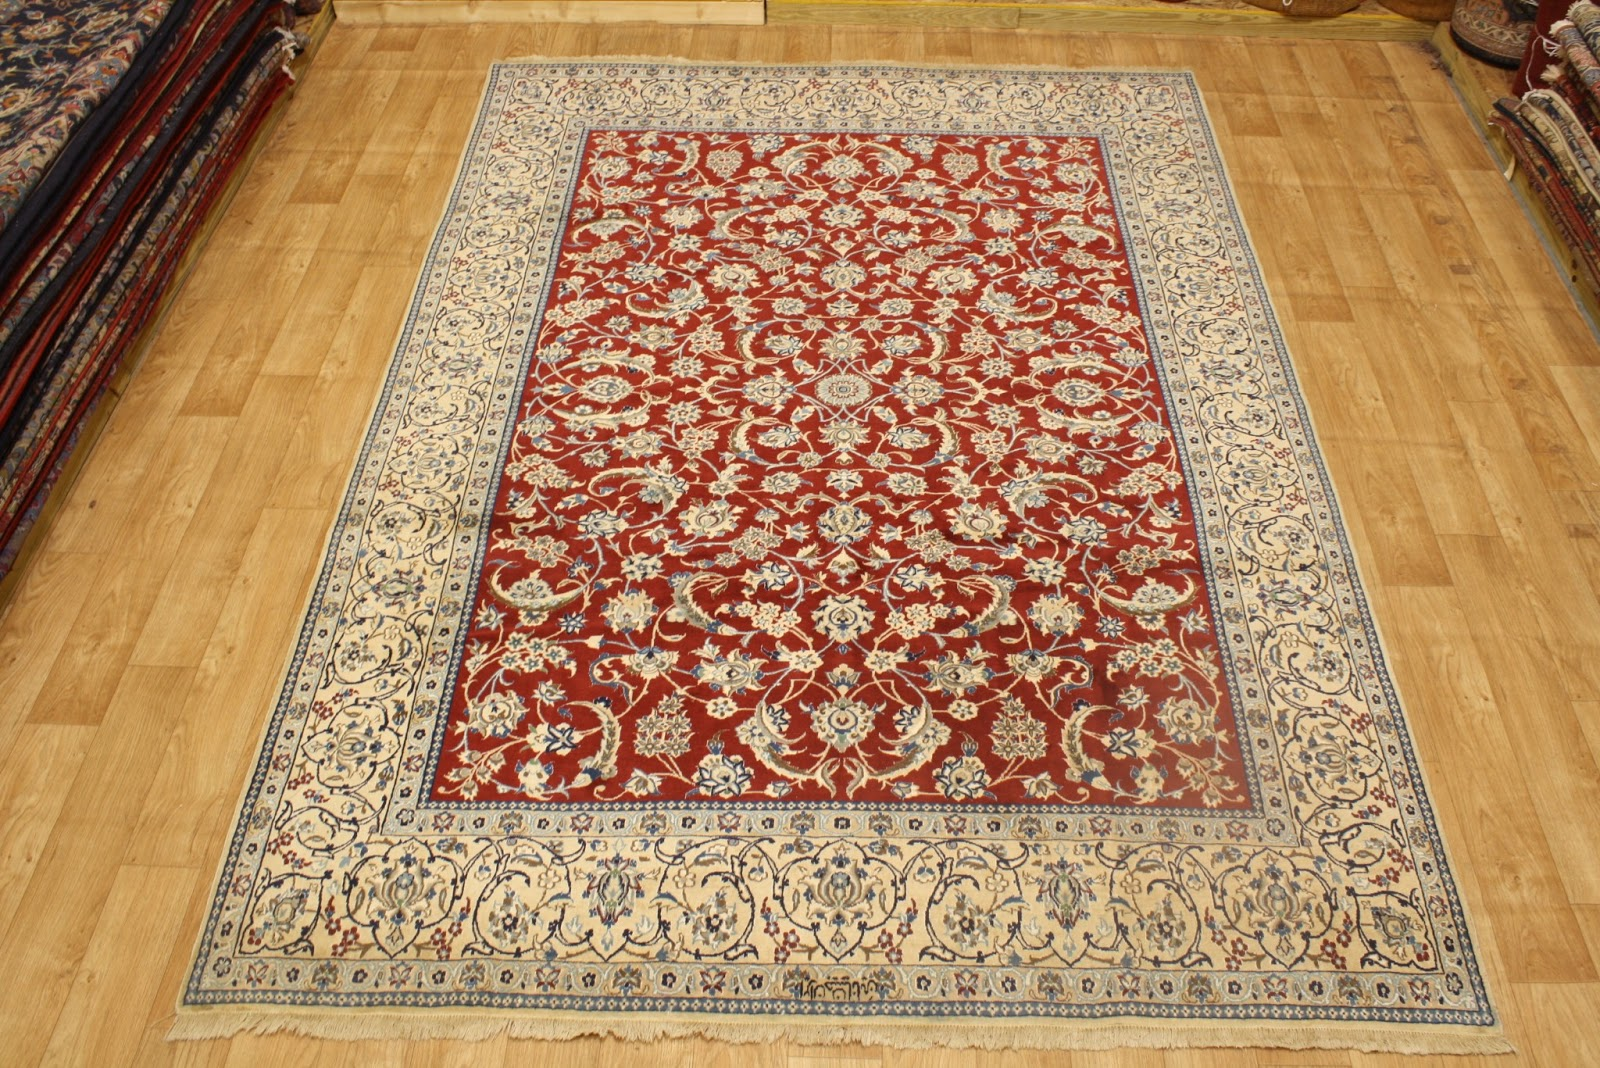 100 Oriental Rug Types 2178 Best Rugs Carpets Kilims Images On Pinterest KilimsOriental